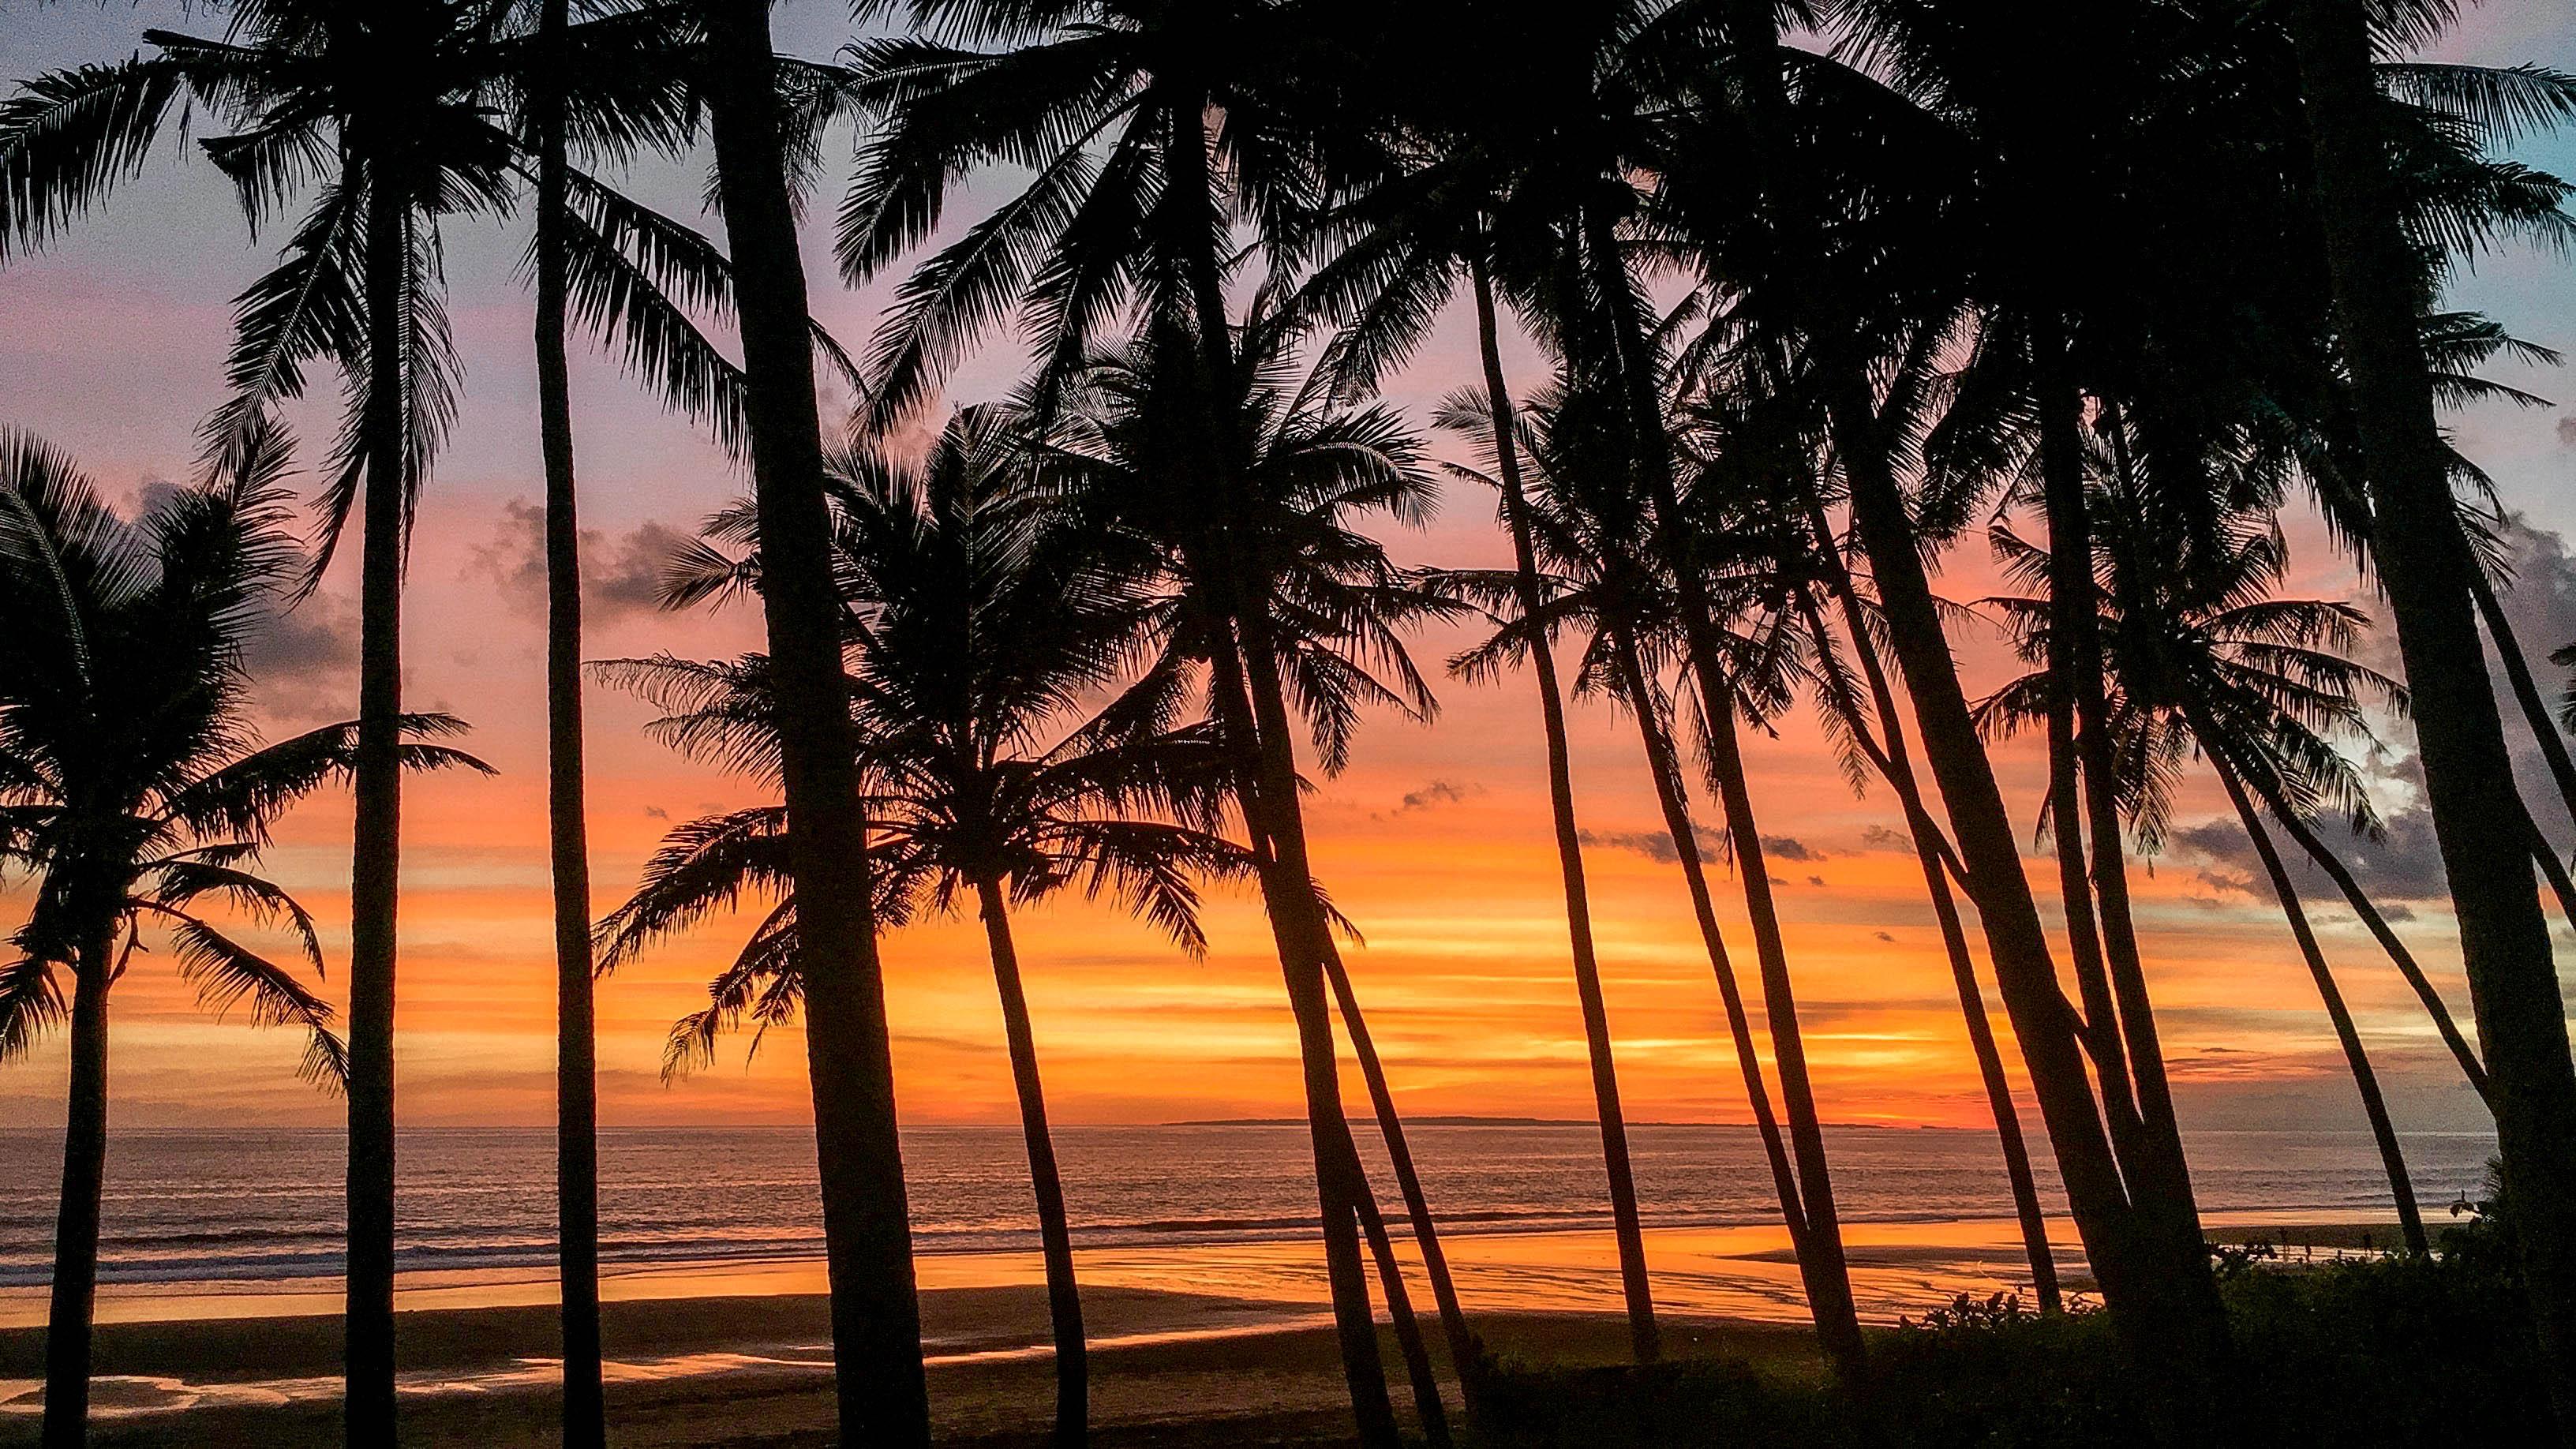 Wanderers & Warriors - Charlie & Lauren UK Travel Couple - Pasut Beach Bali - The Black Sand Beach In Bali - Pantai Pasut - Pantai Sunset